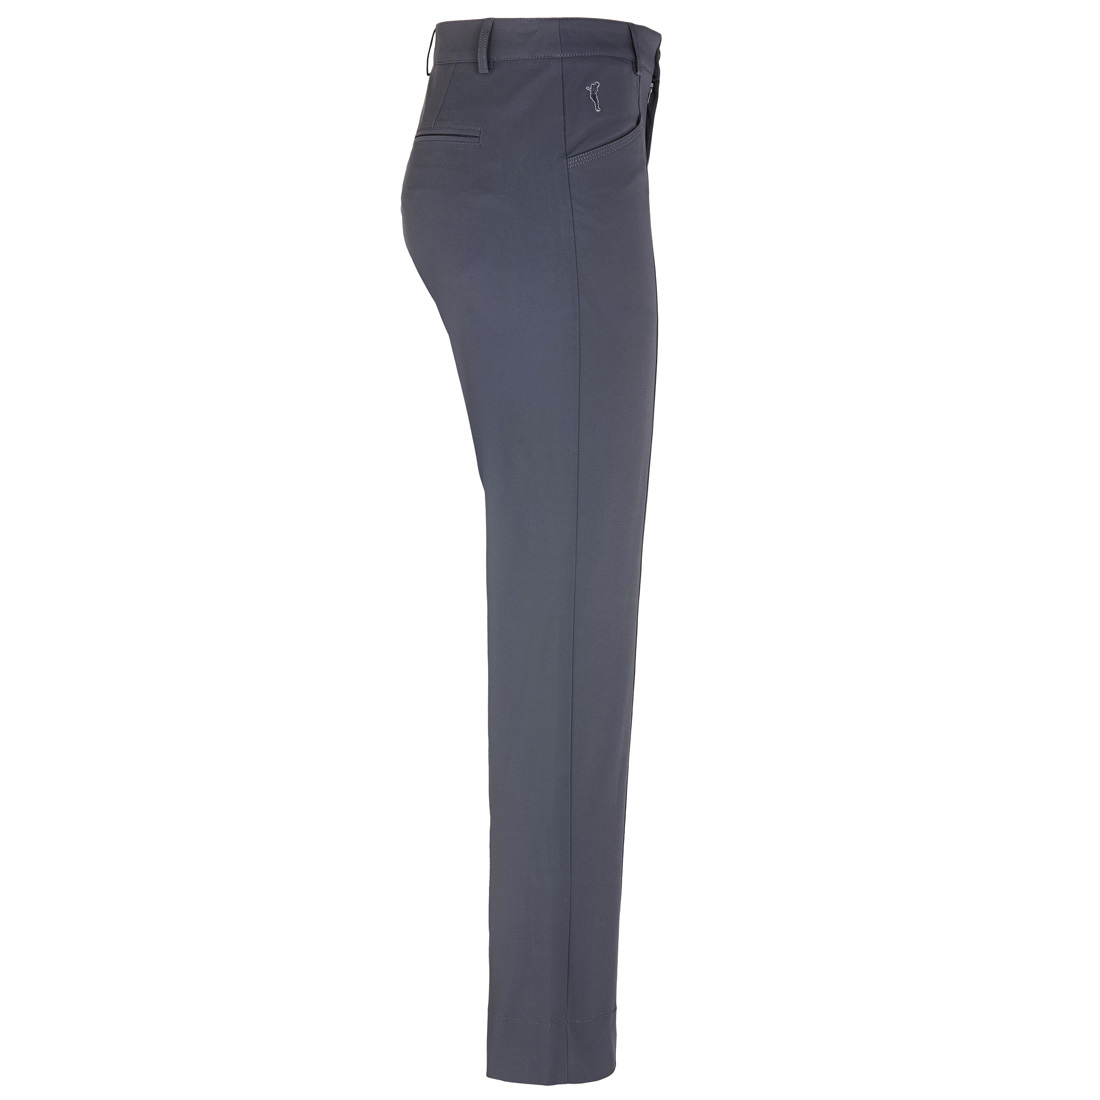 Techno Stretch 7/8 Damen Baumwoll-Golfhose in Slim Fit